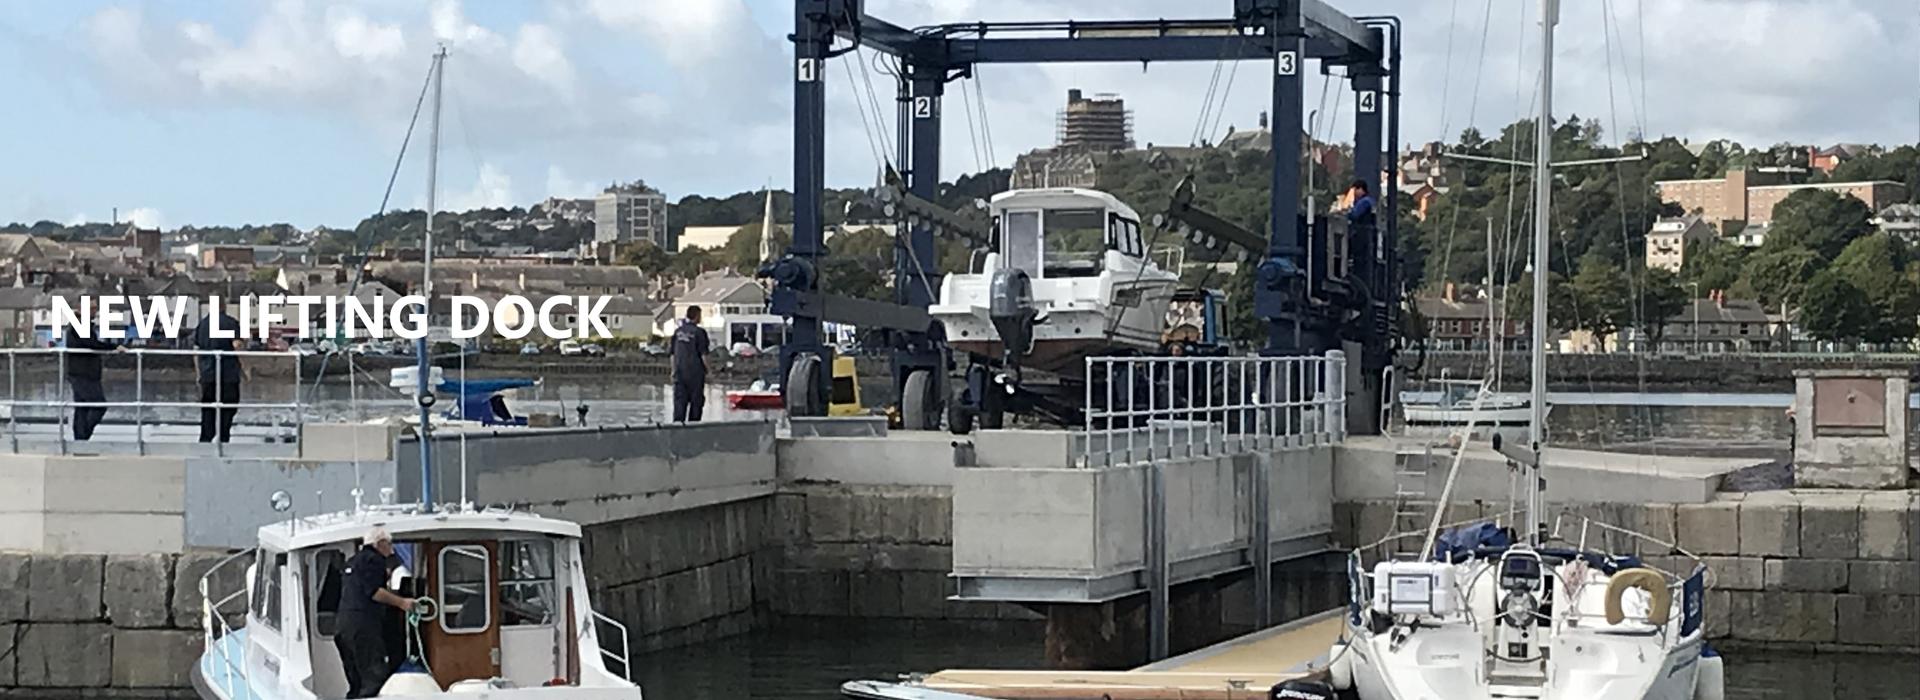 New Lifting Dock